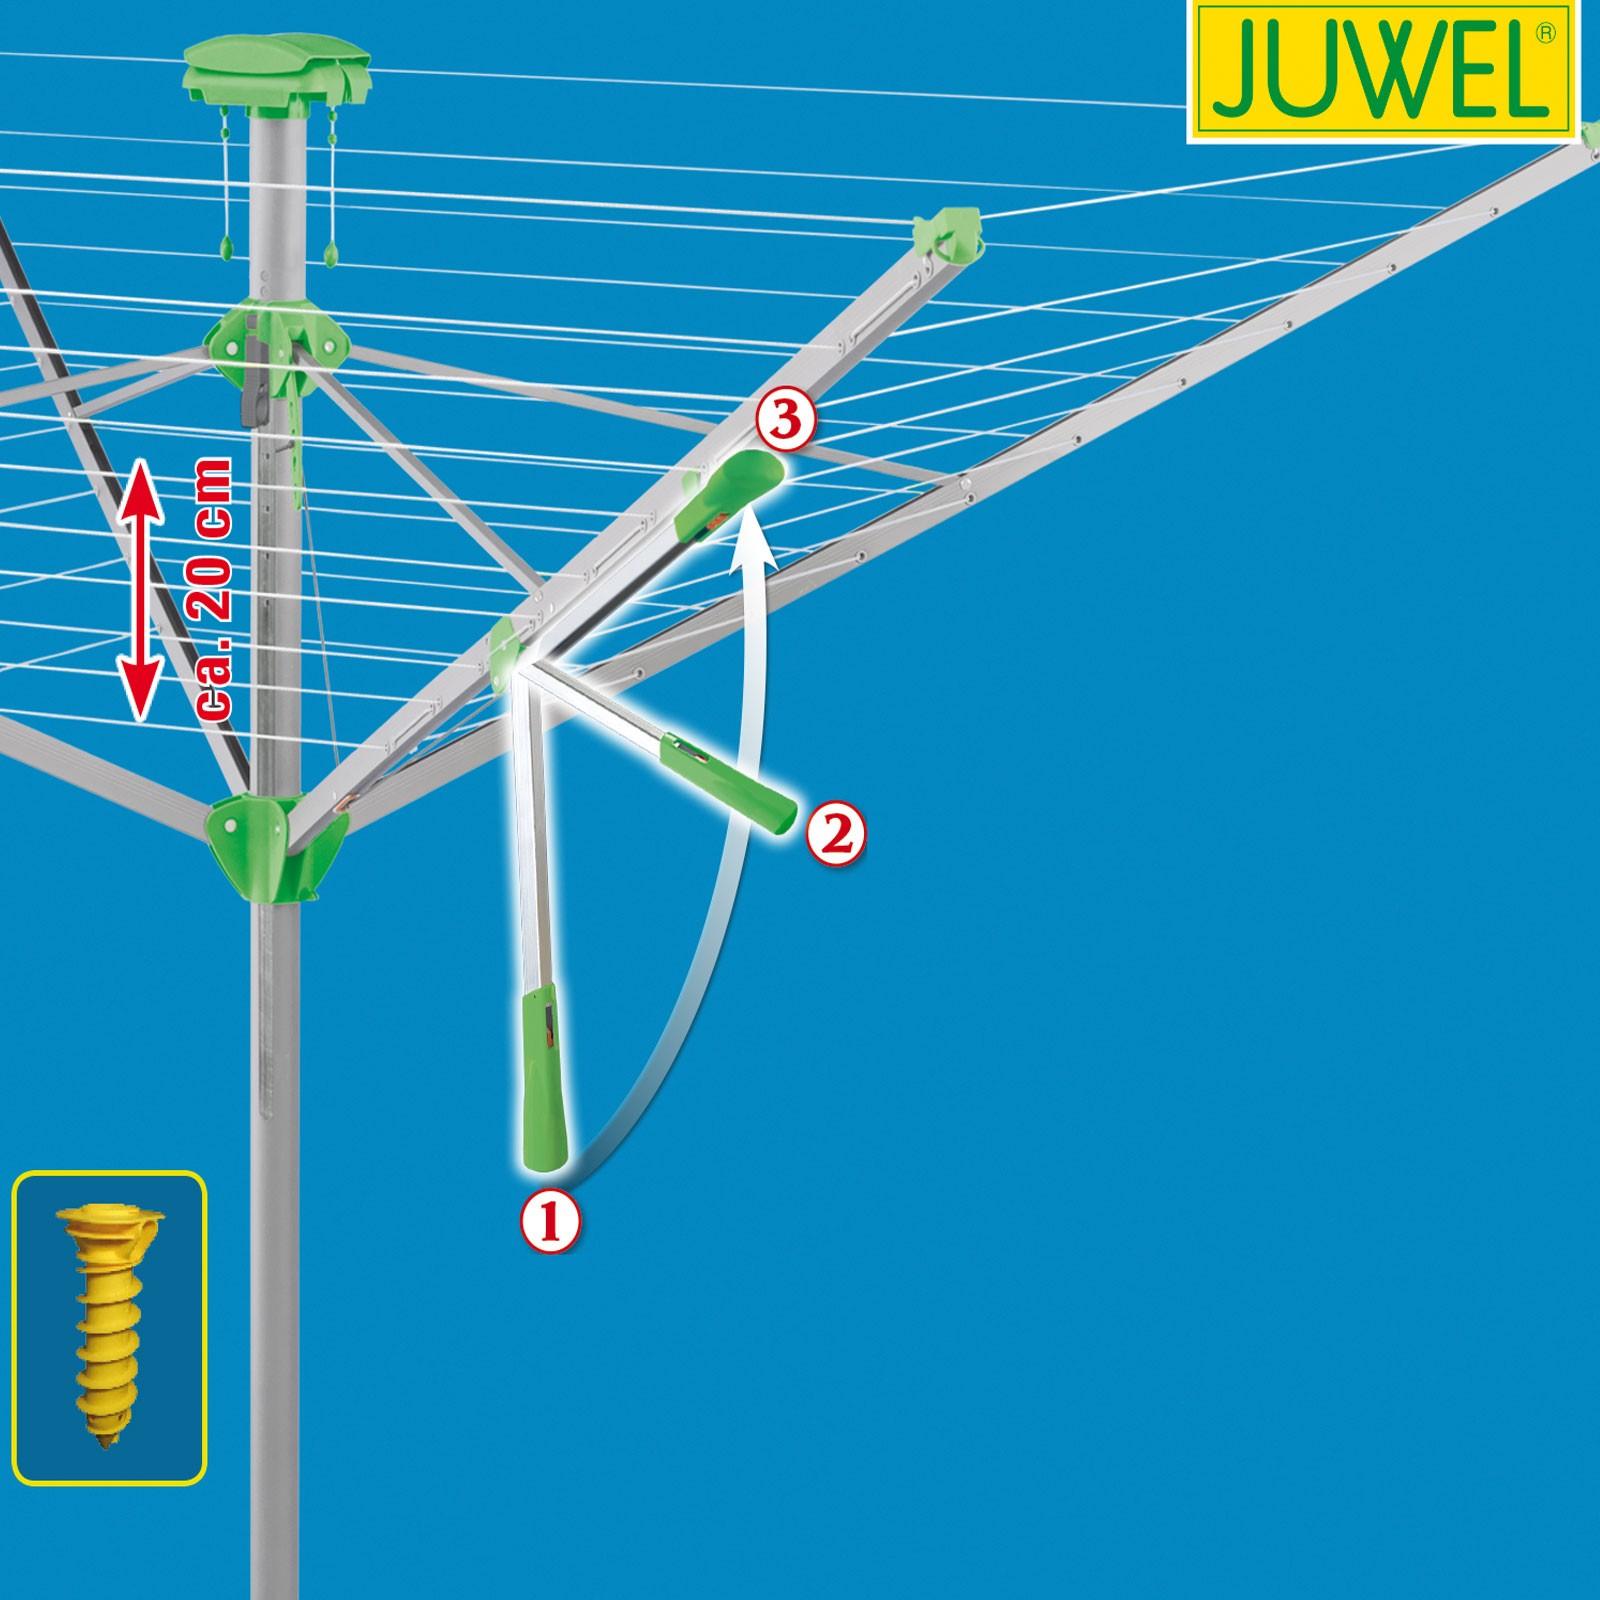 Juwel Wäschespinne Wäschetrockner NOVAPLUS 600 LIFT, Wäschetrockner, Wäscheleine, Wäschespinne, Wäscheständer, ,